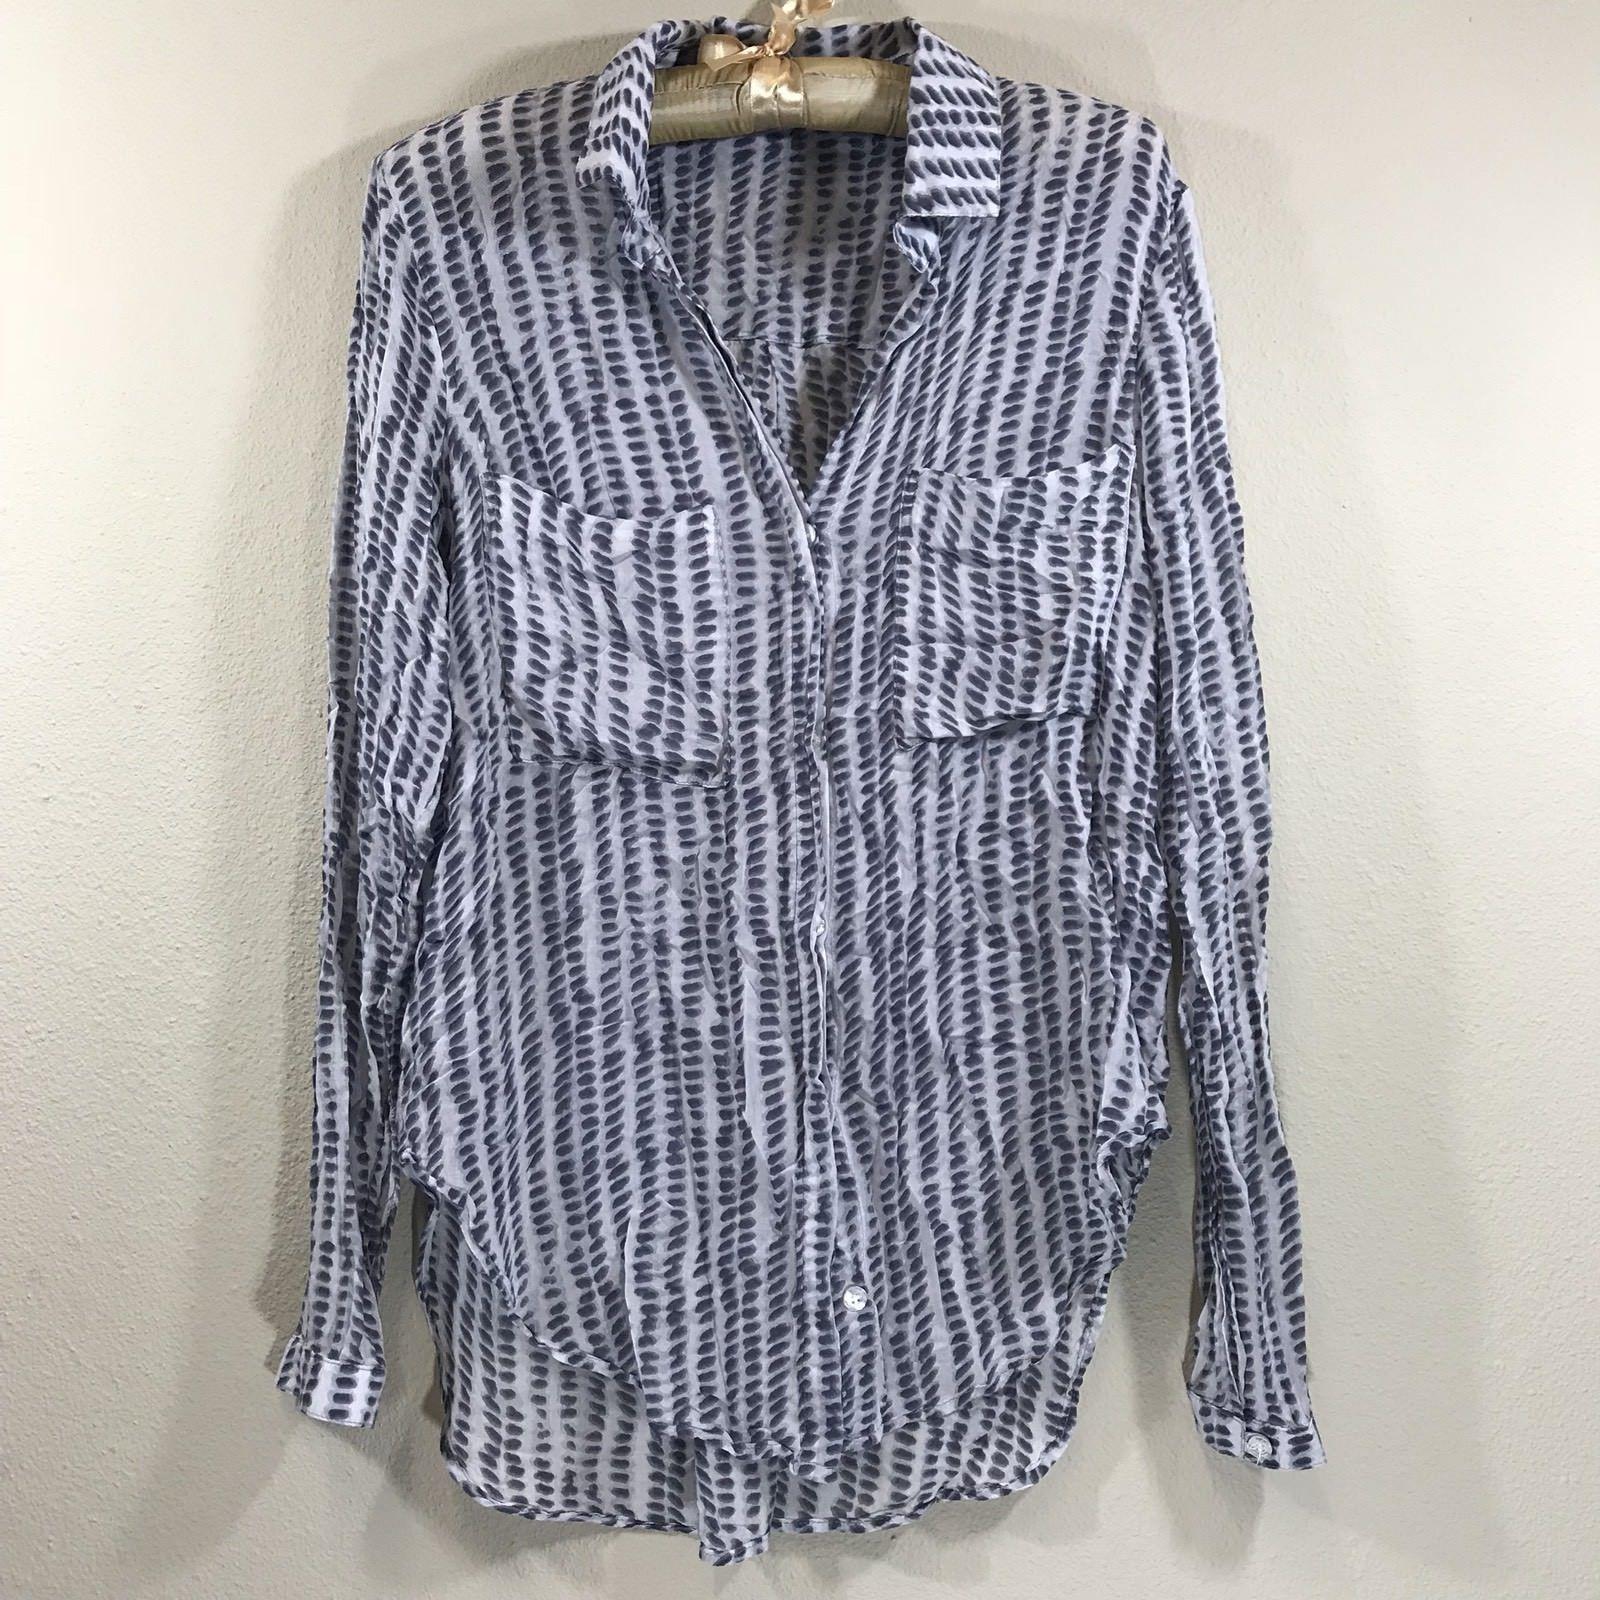 220142cdd73 S l1600. S l1600. Previous. Anthropologie Cloth & stone blue white hi low  pocket buttondown top blouse small